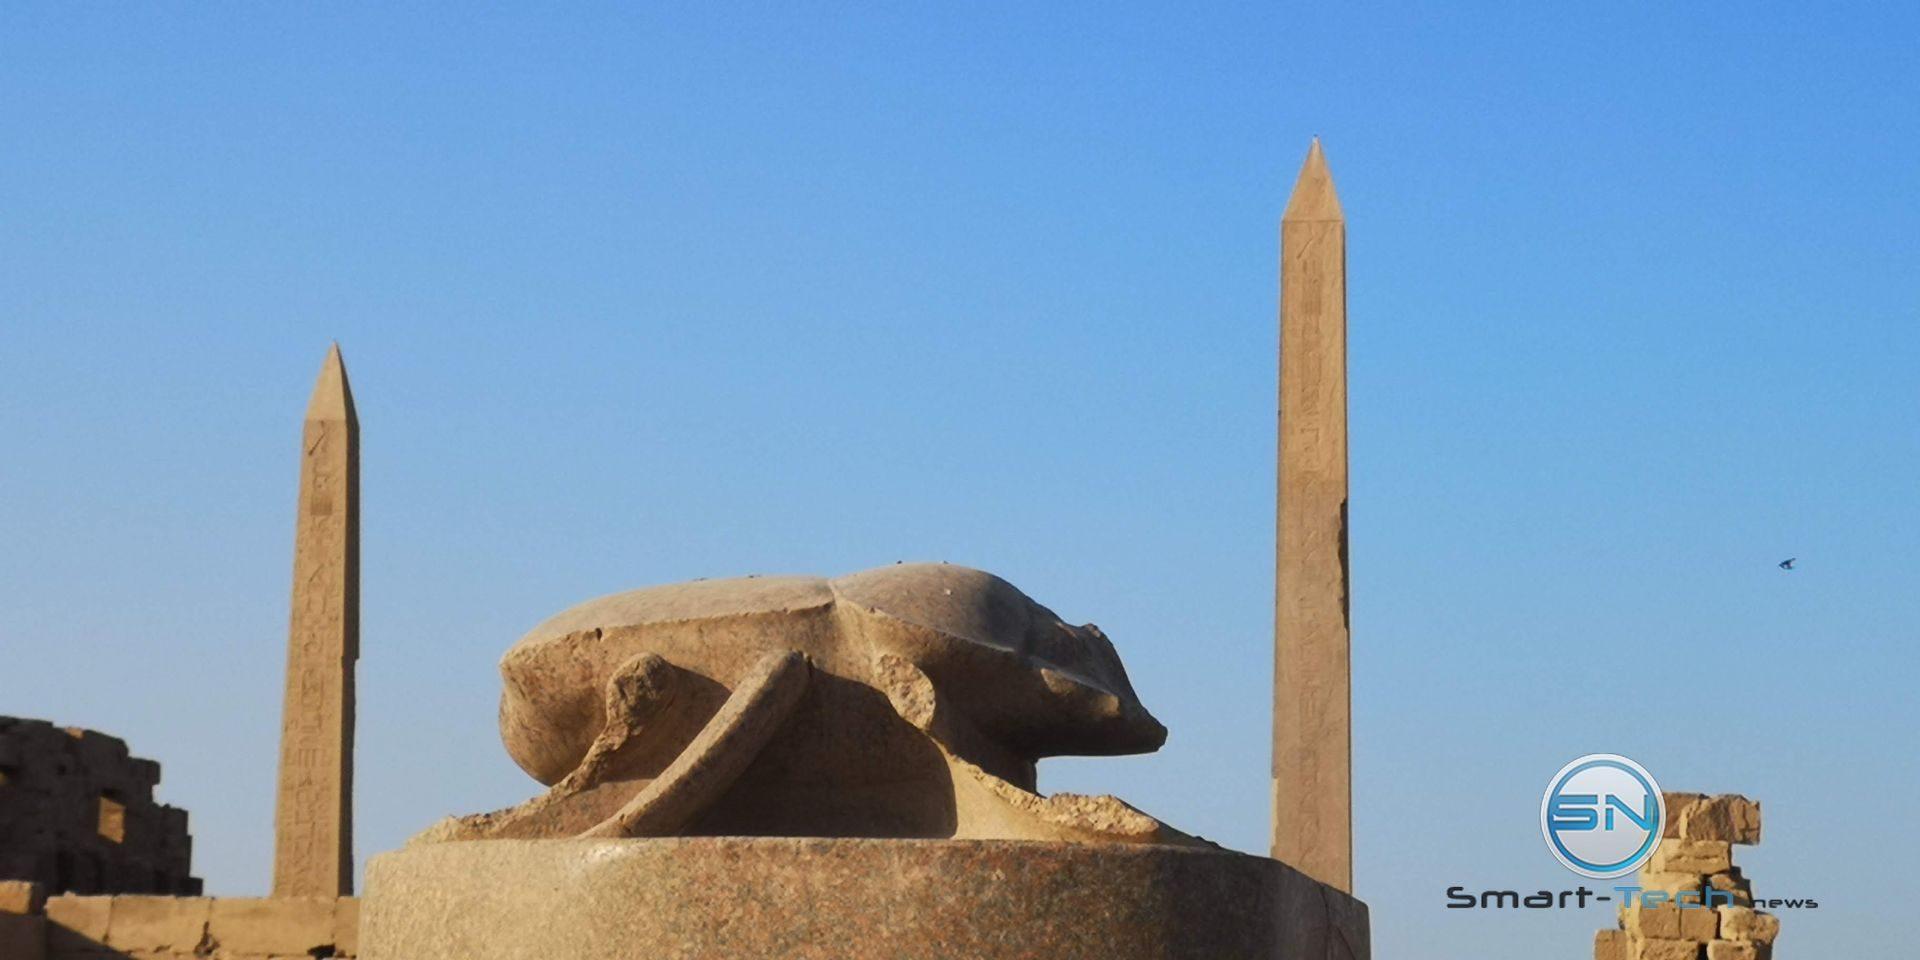 Glück Luxor Huawei P20pro